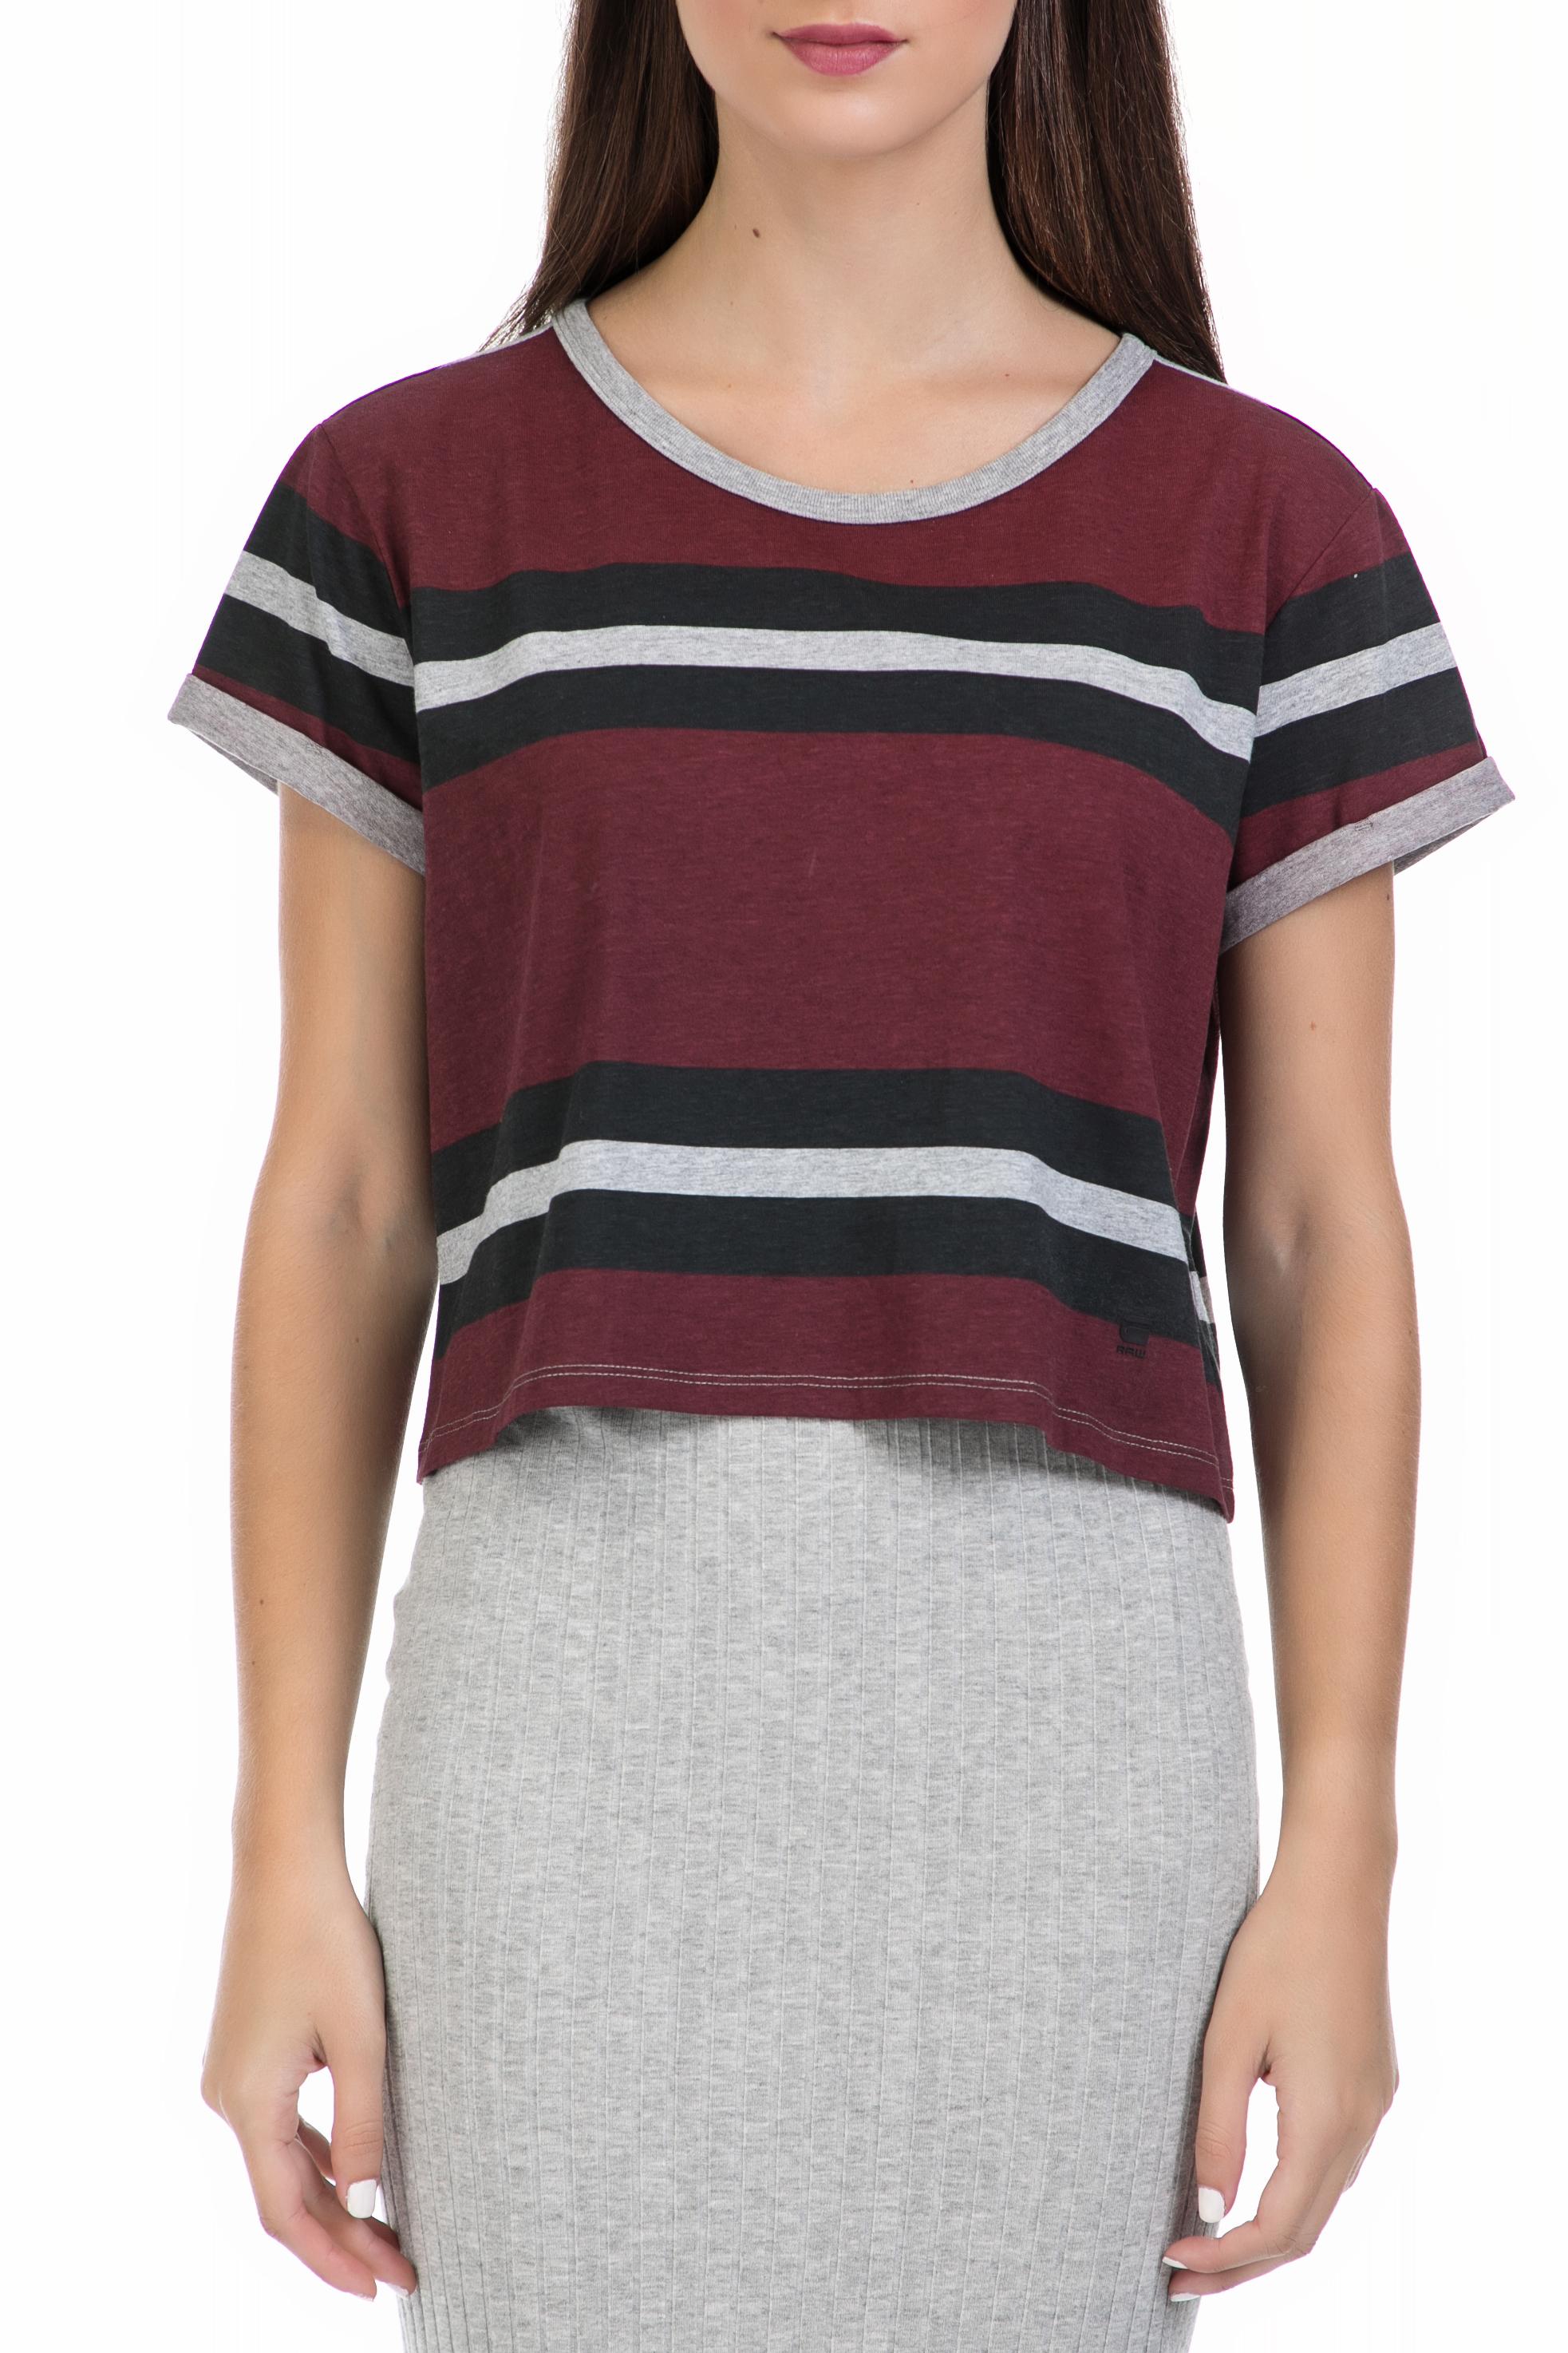 G-STAR RAW - Γυναικεία μπλούζα Eva straight cropped G-Star μπορντό γυναικεία ρούχα μπλούζες t shirt